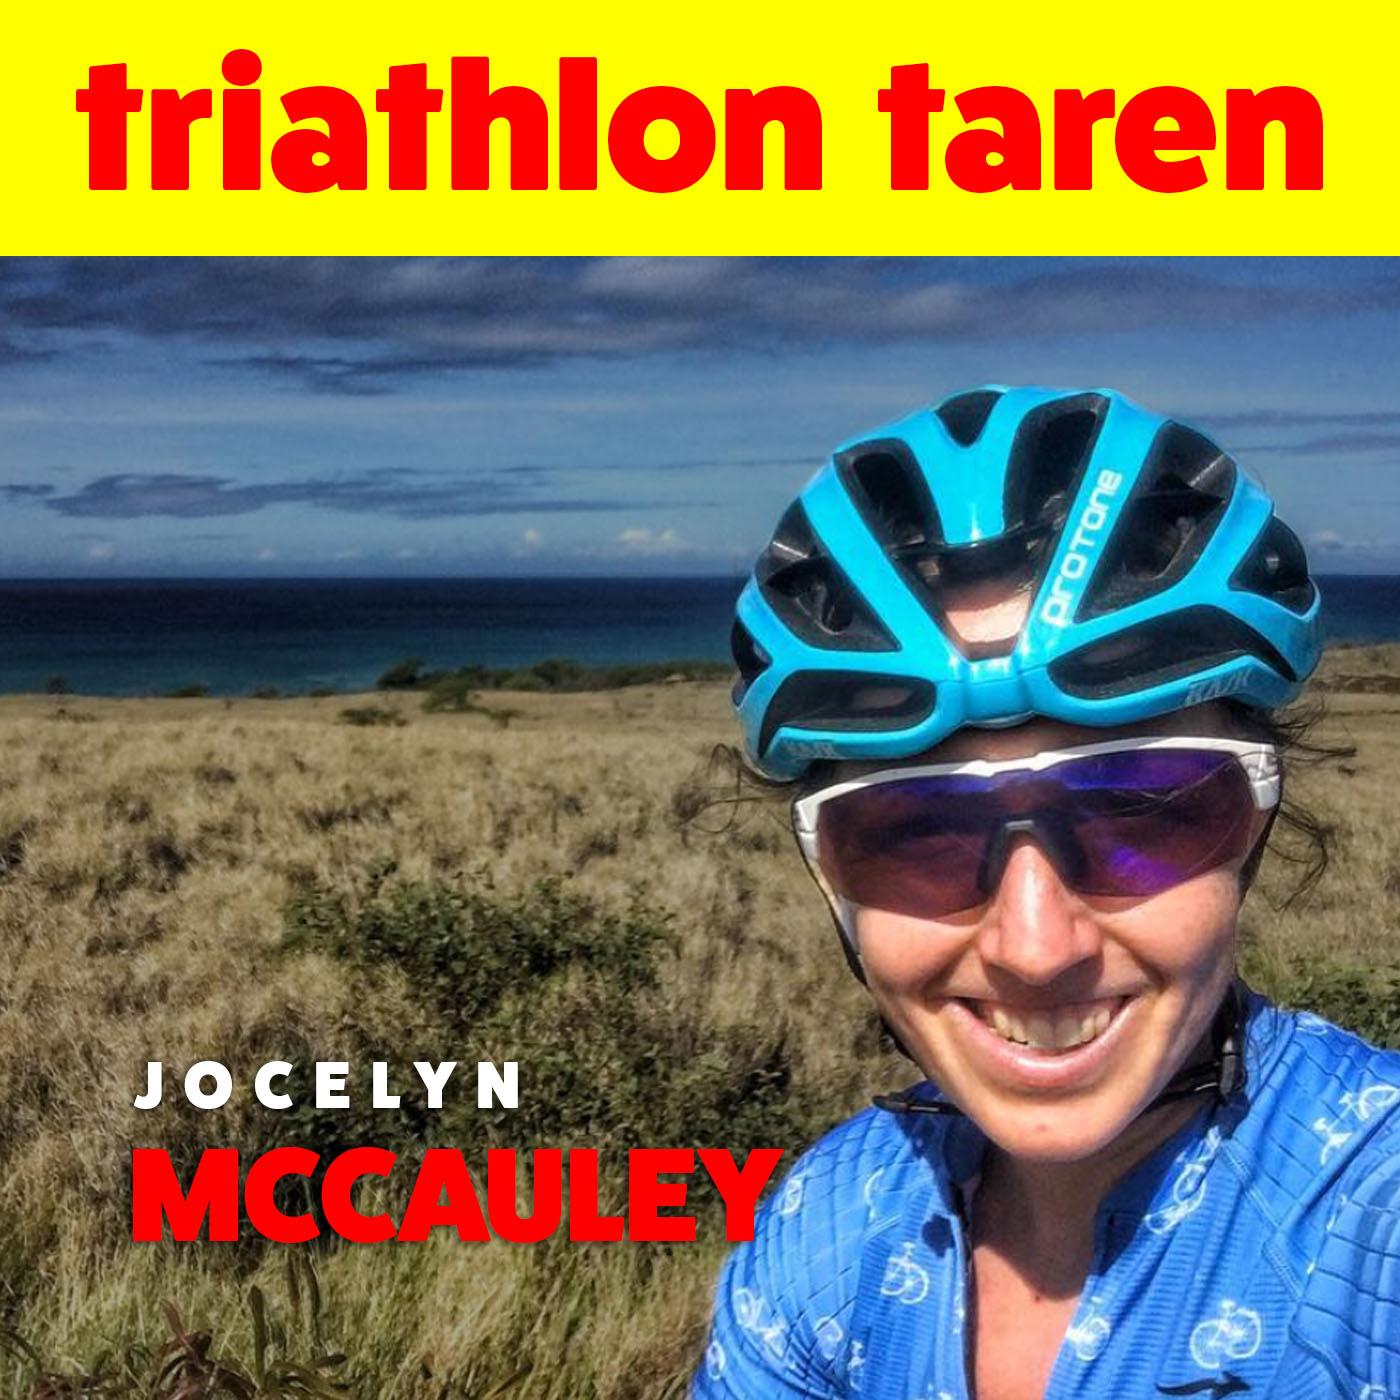 Jocelyn McCauley | Juggling pro triathlon and parenthood